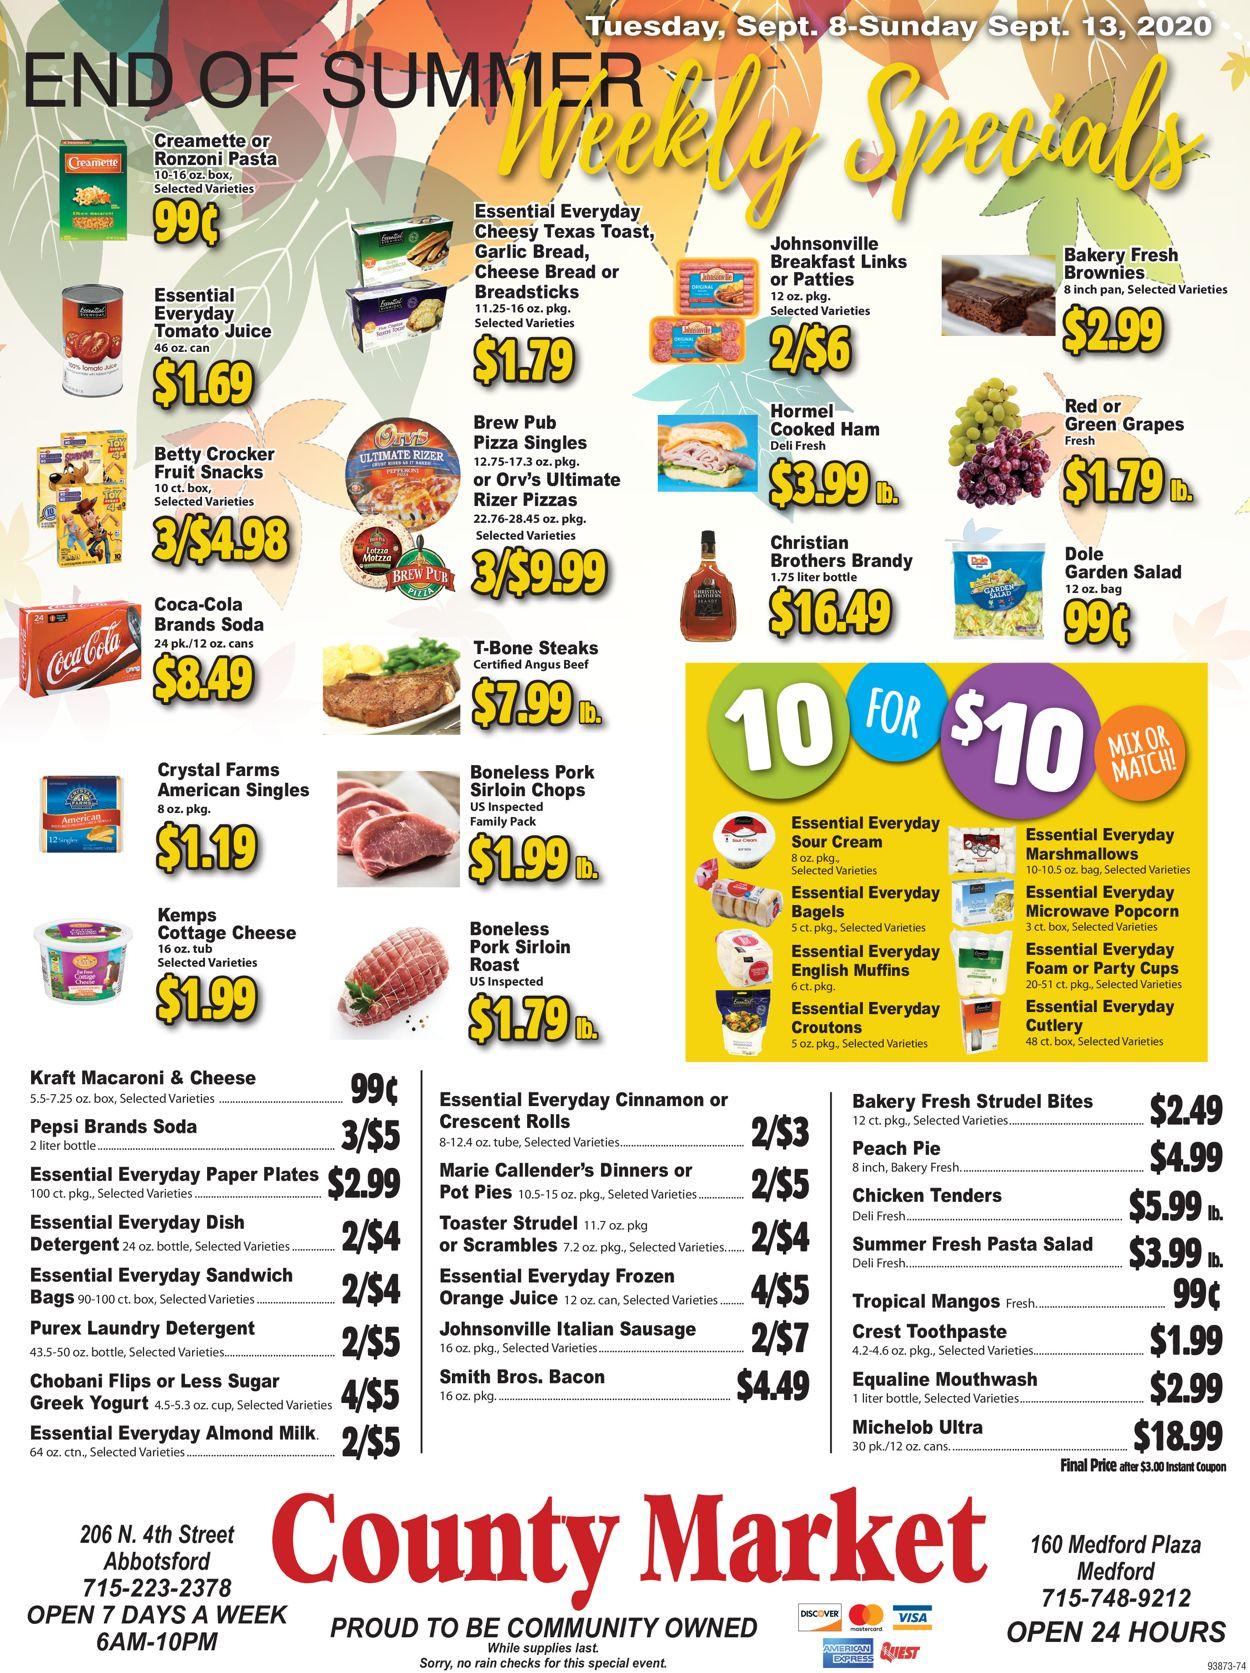 County Market Weekly Ad Circular - valid 09/08-09/13/2020